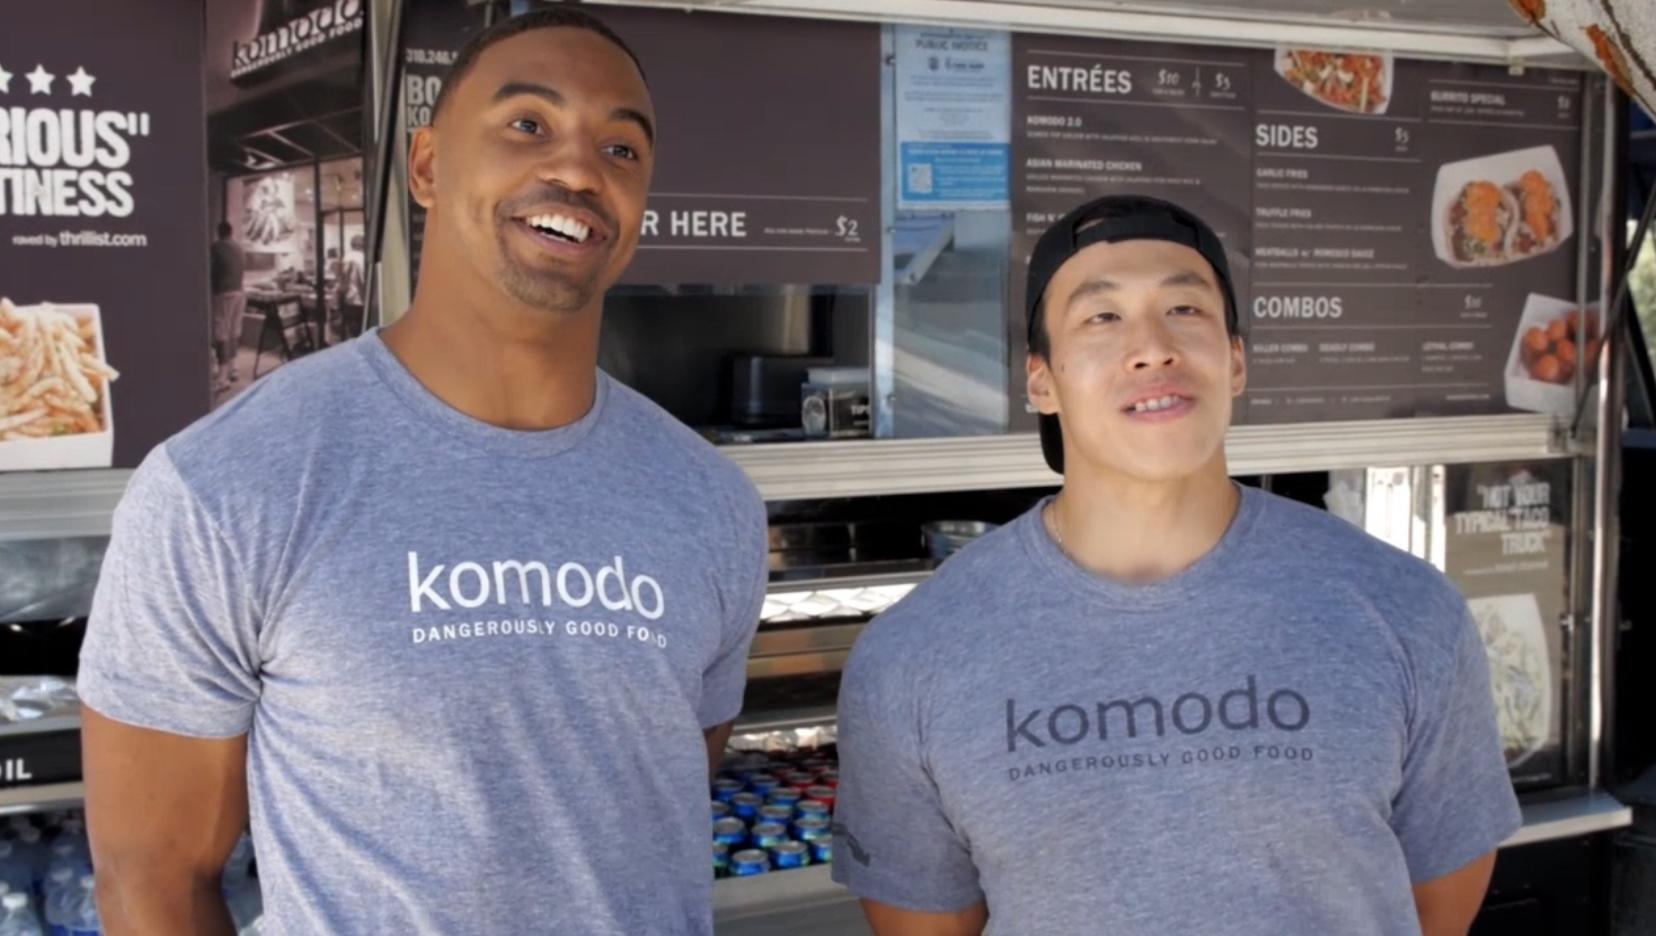 Komodo_MSN_Offseason_6